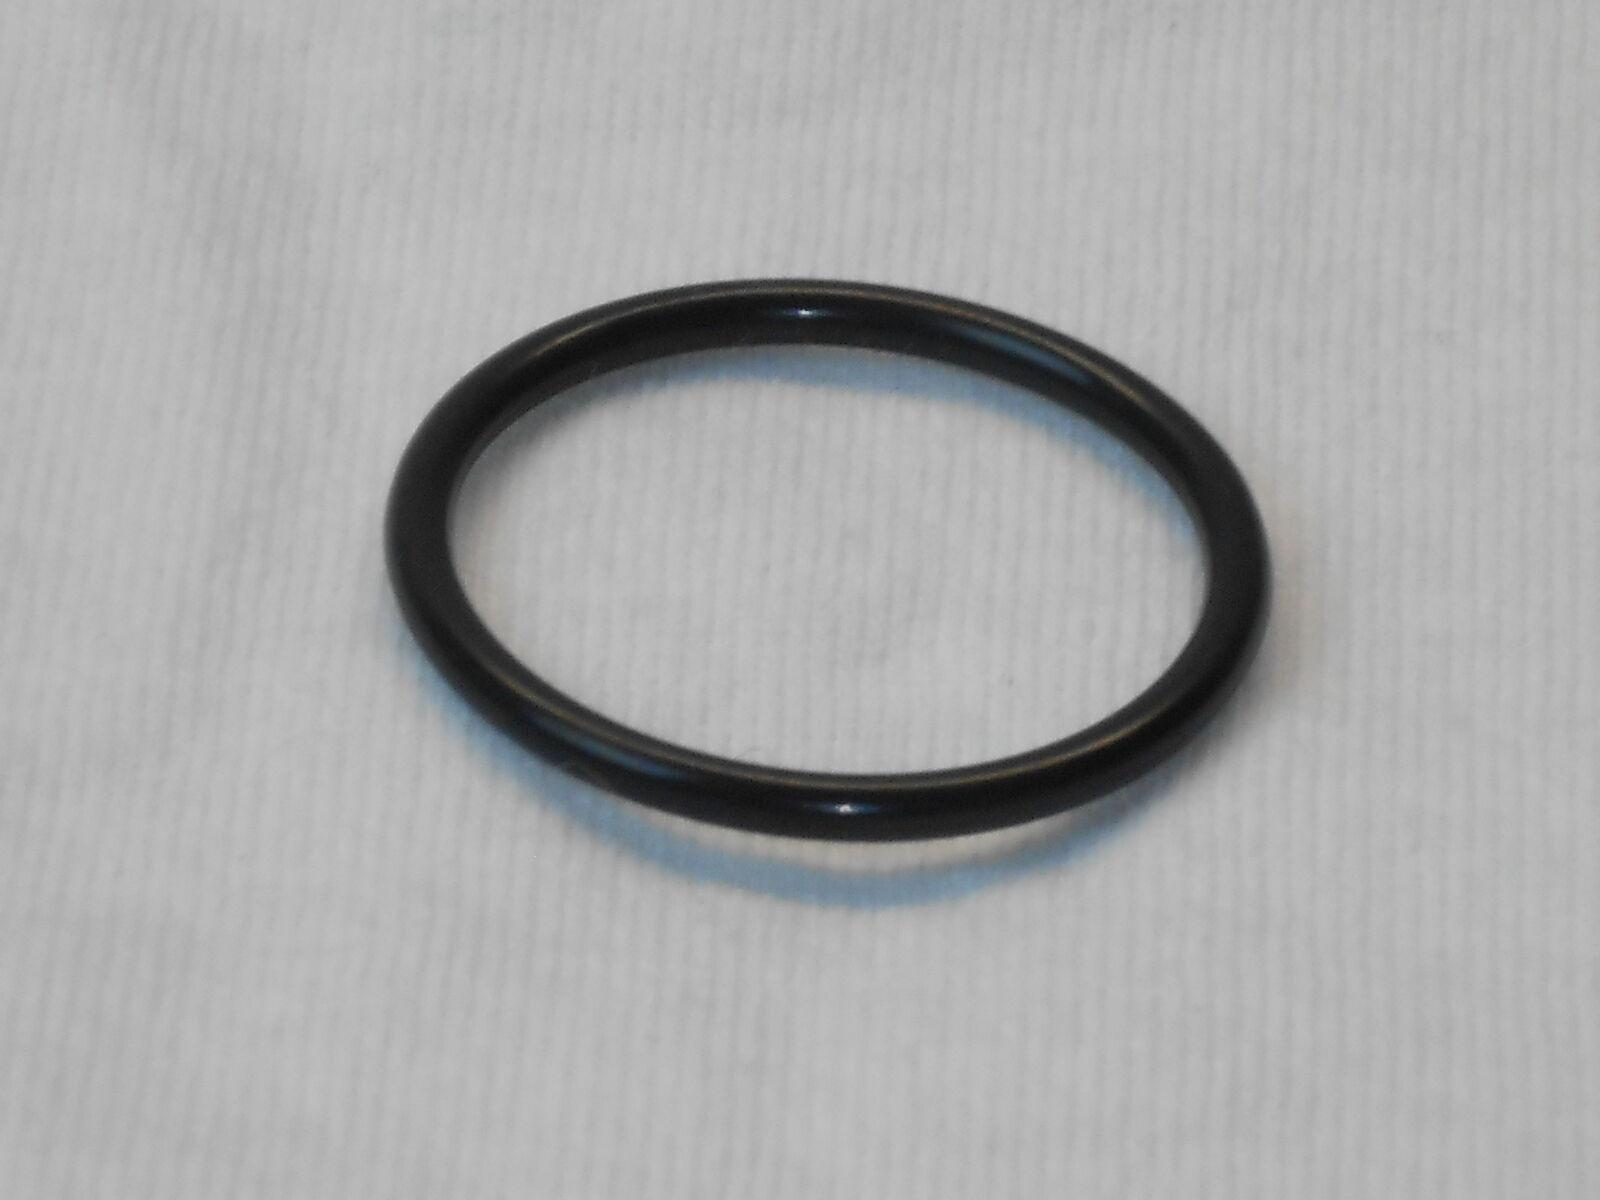 Suzuki 09280-26006 O-Ring Qty 2